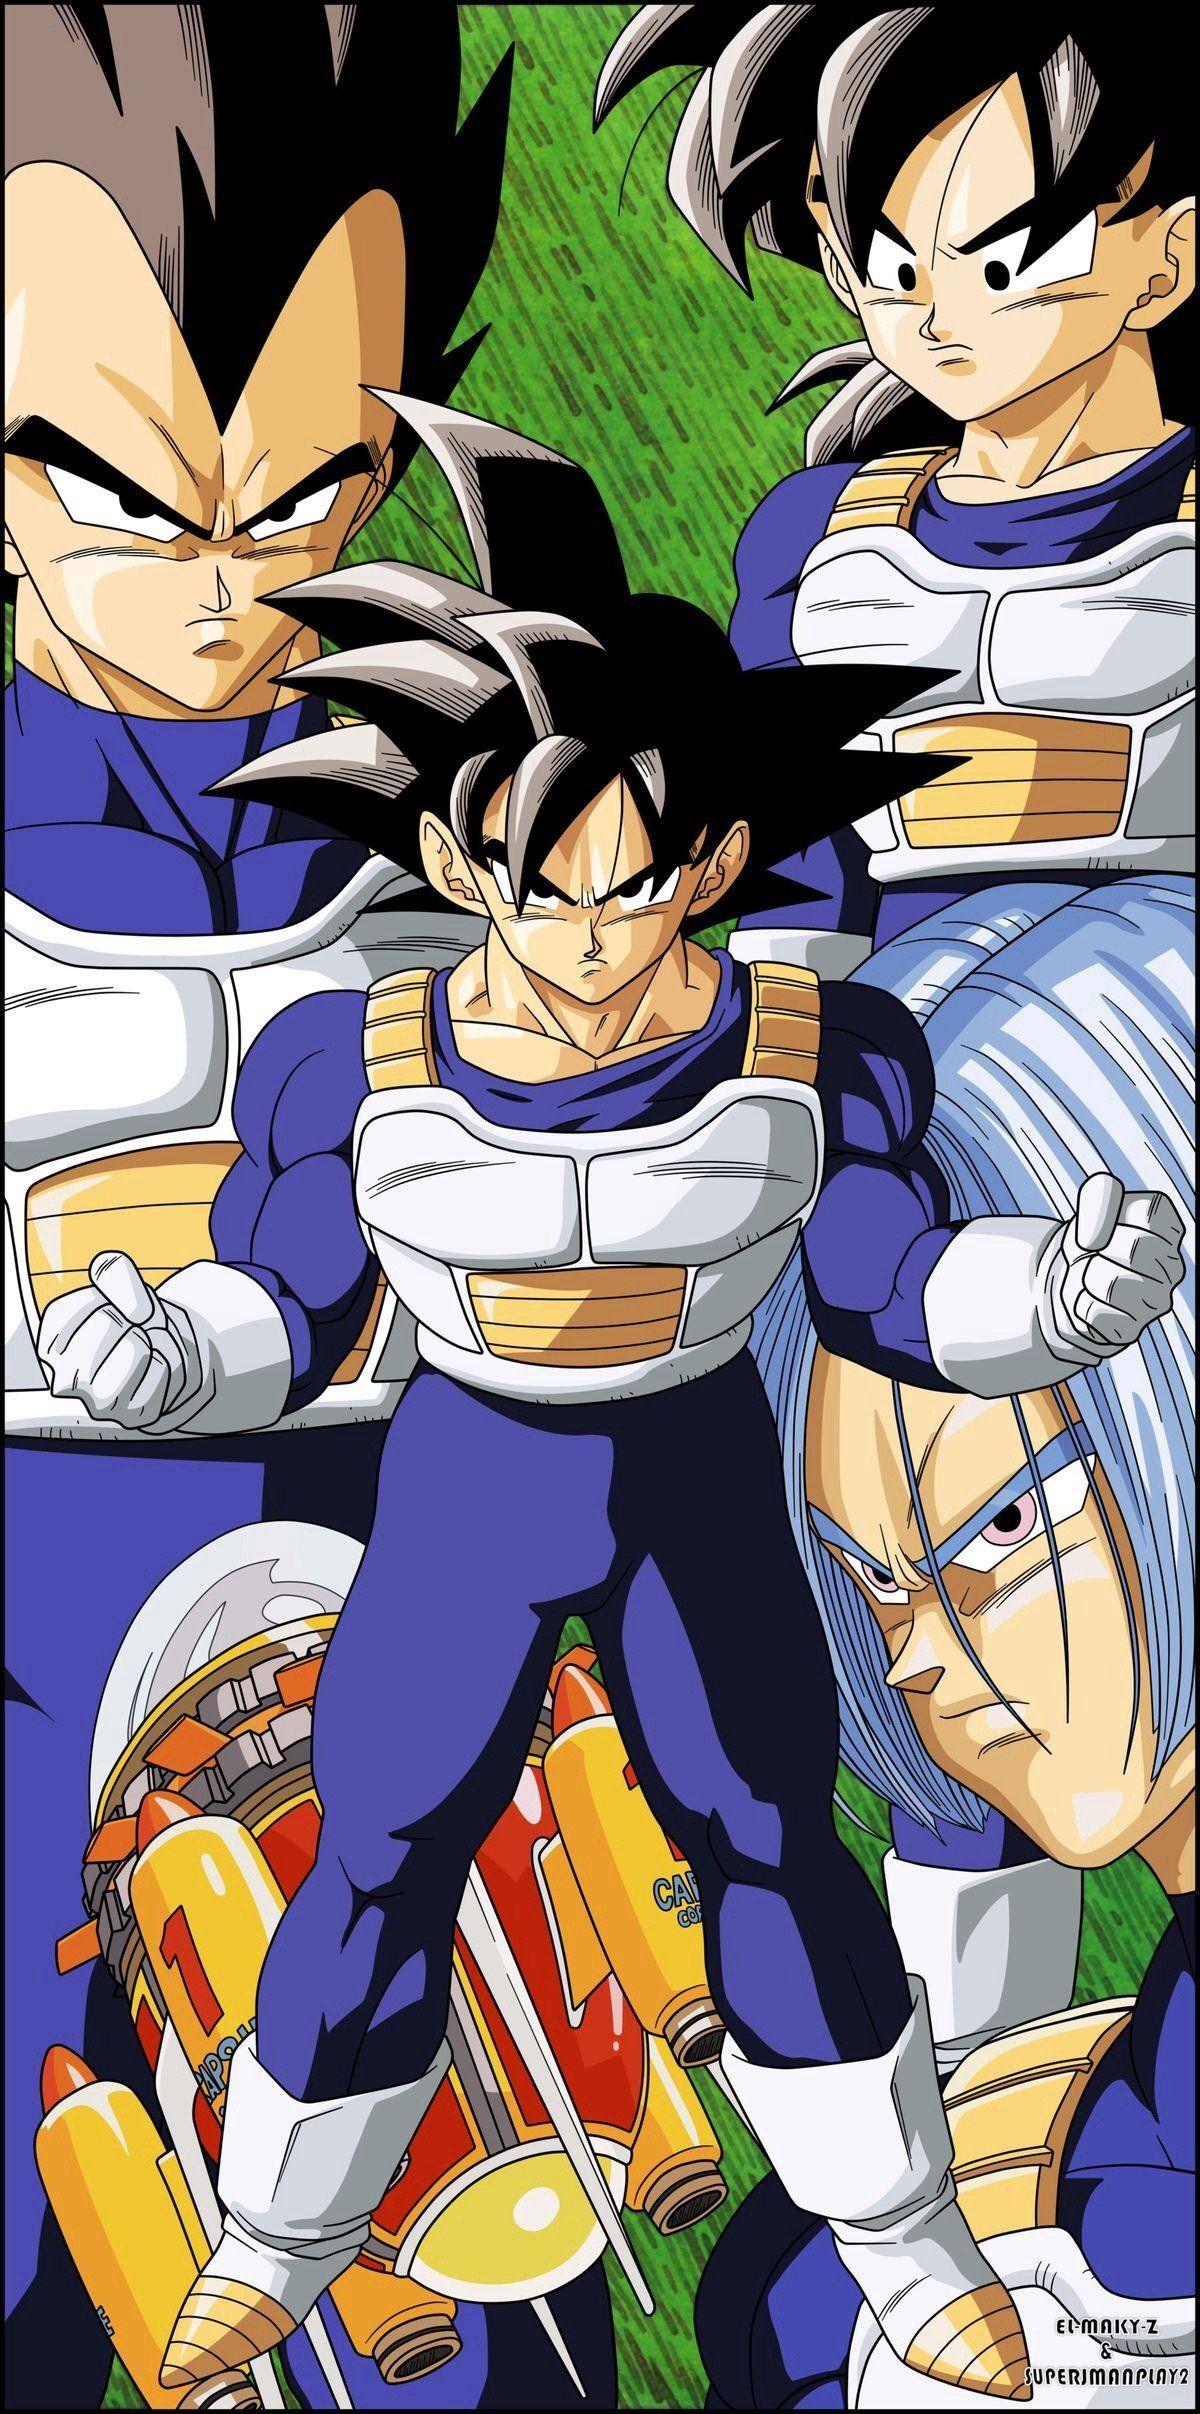 250 Ilustraciones De Dragon Ball Z Gt Super Megapost Taringa Dragon Ball Artwork Dragon Ball Z Dragon Ball Goku